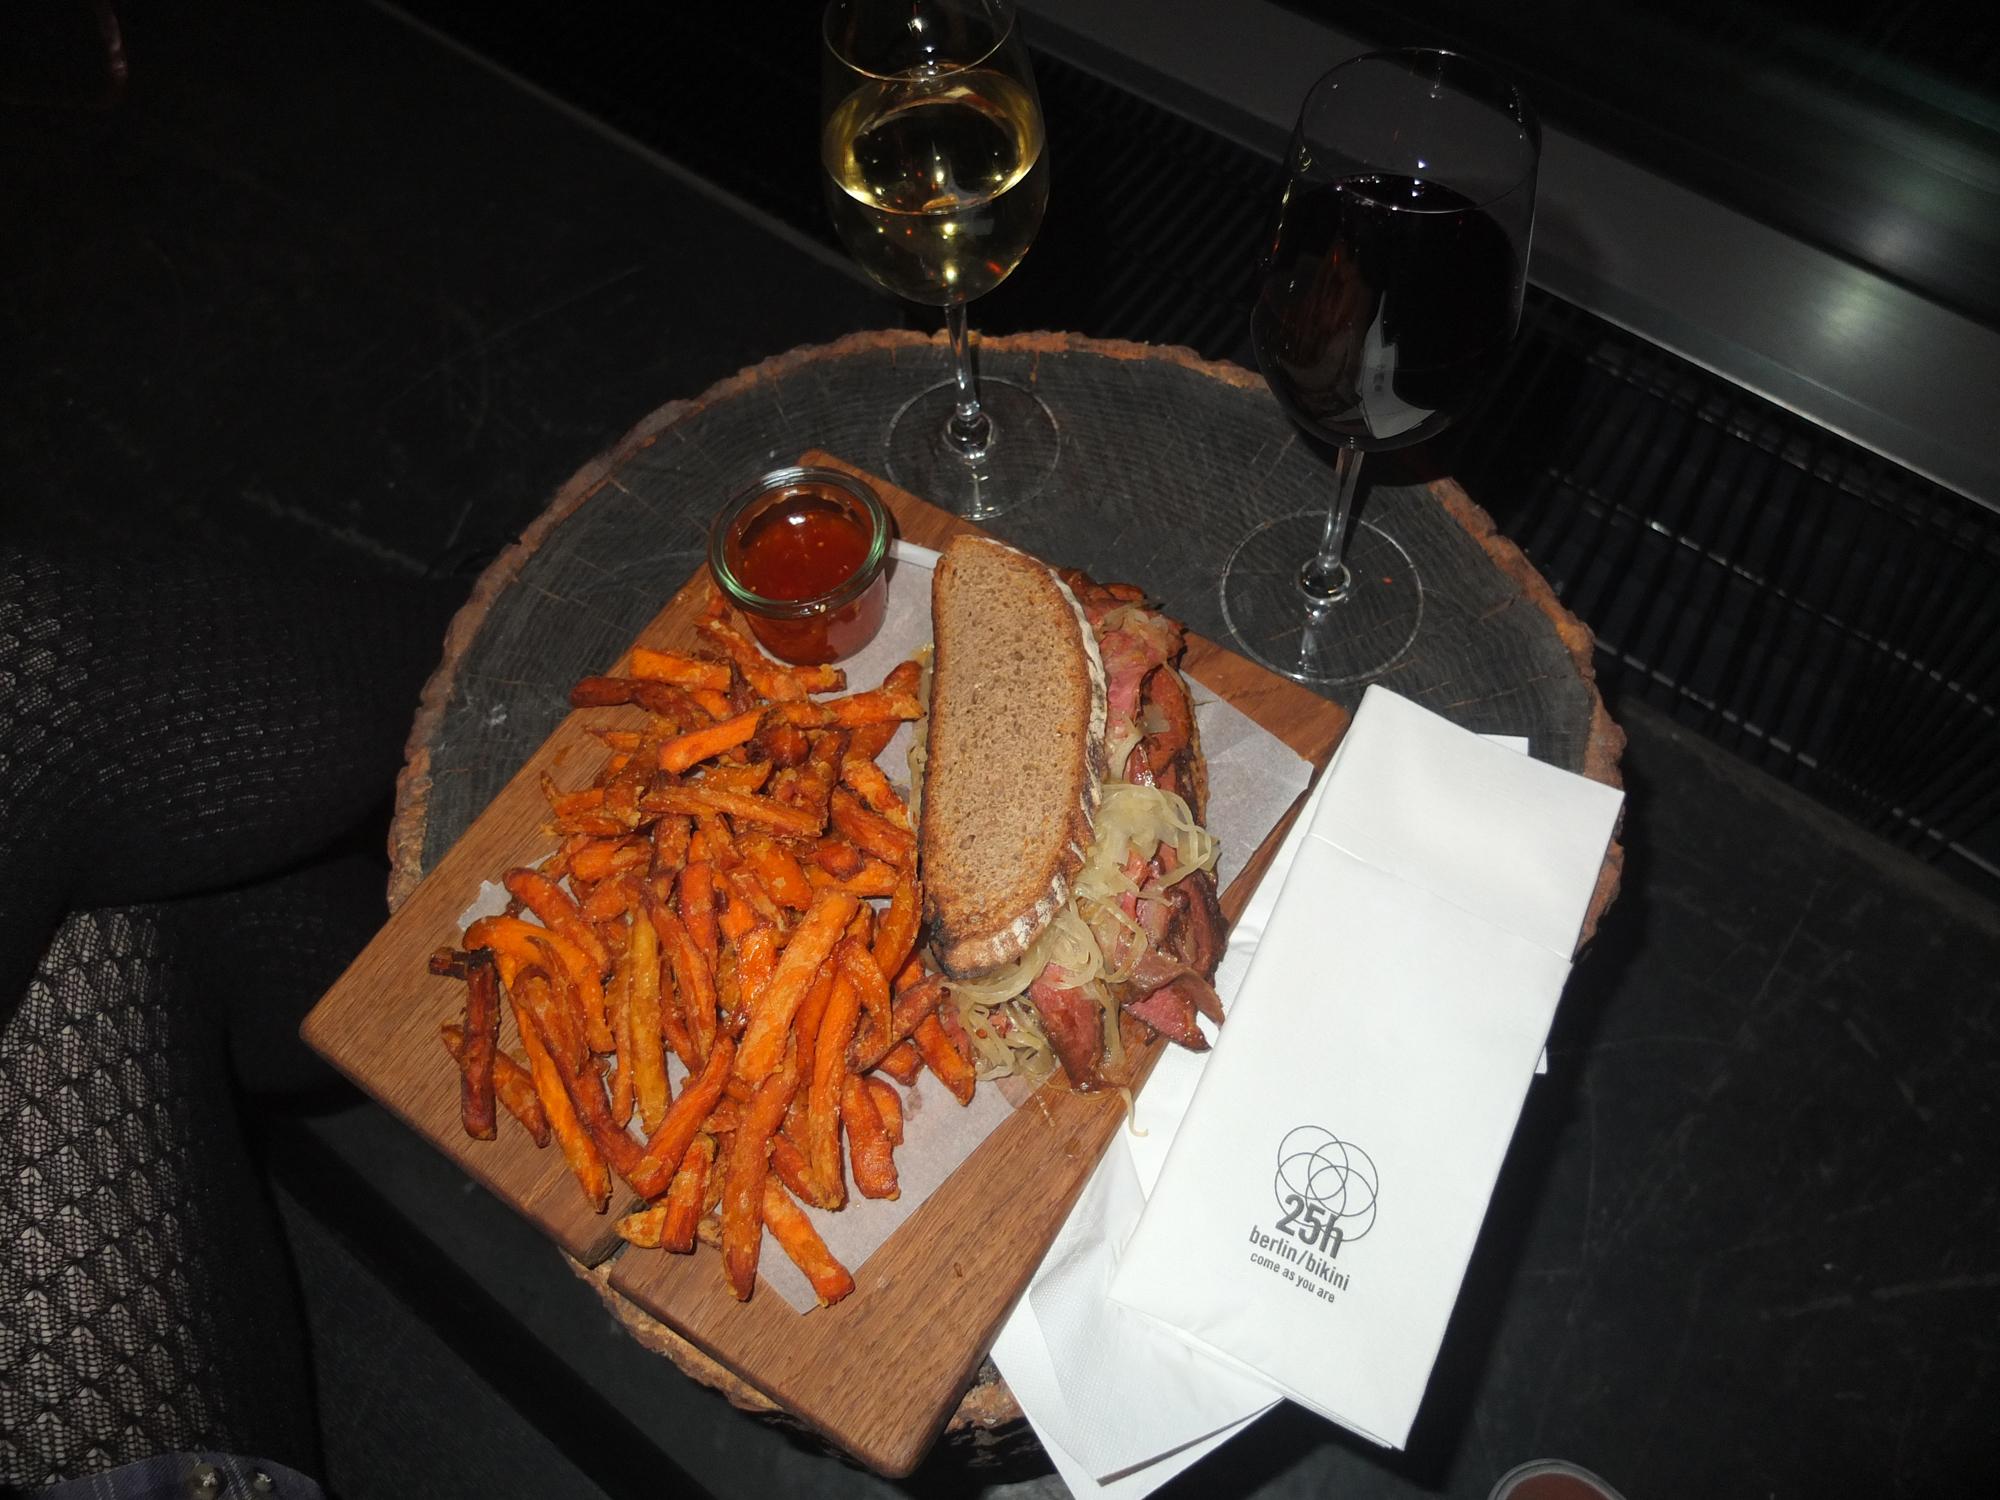 25h Bikini Hotel Berlin - Monkey Bar Pastrami Sandwich